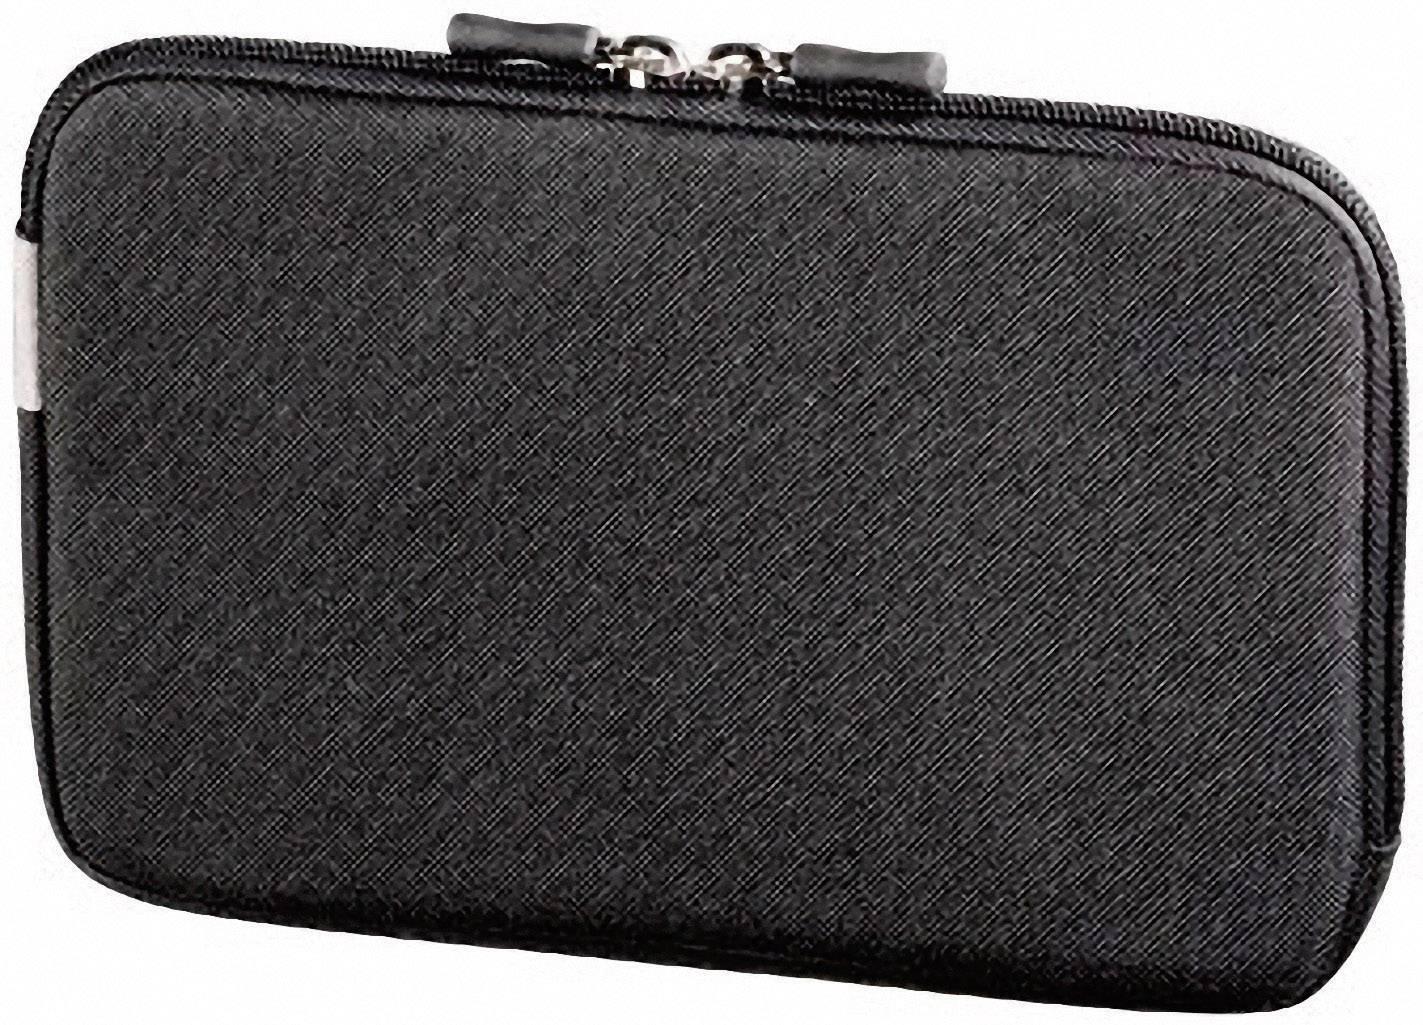 "Ochranné pouzdro Hama Sleeve ""Tab"" pro Tablet-PCs bis 20,32 cm (8""), černé"